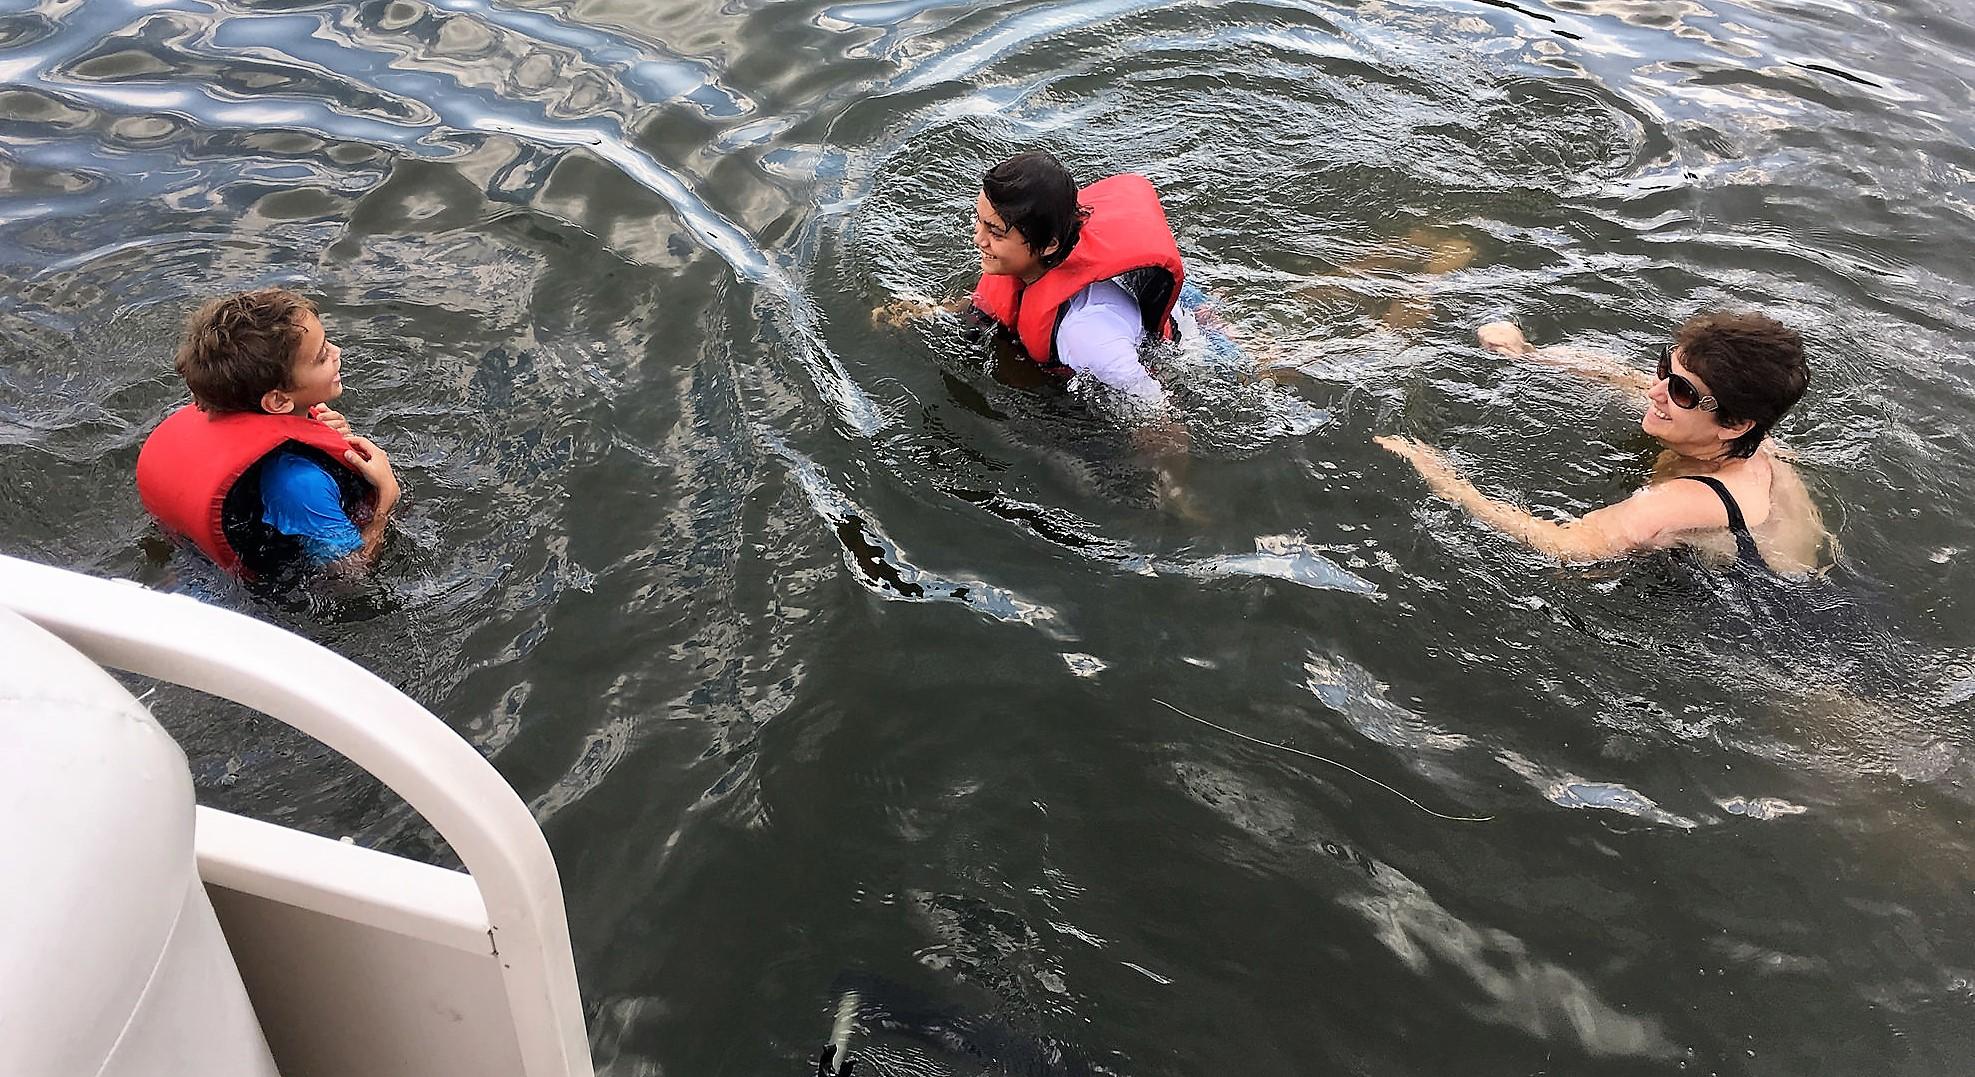 Family Reunion on Greenwood Lake - swimming with grandma